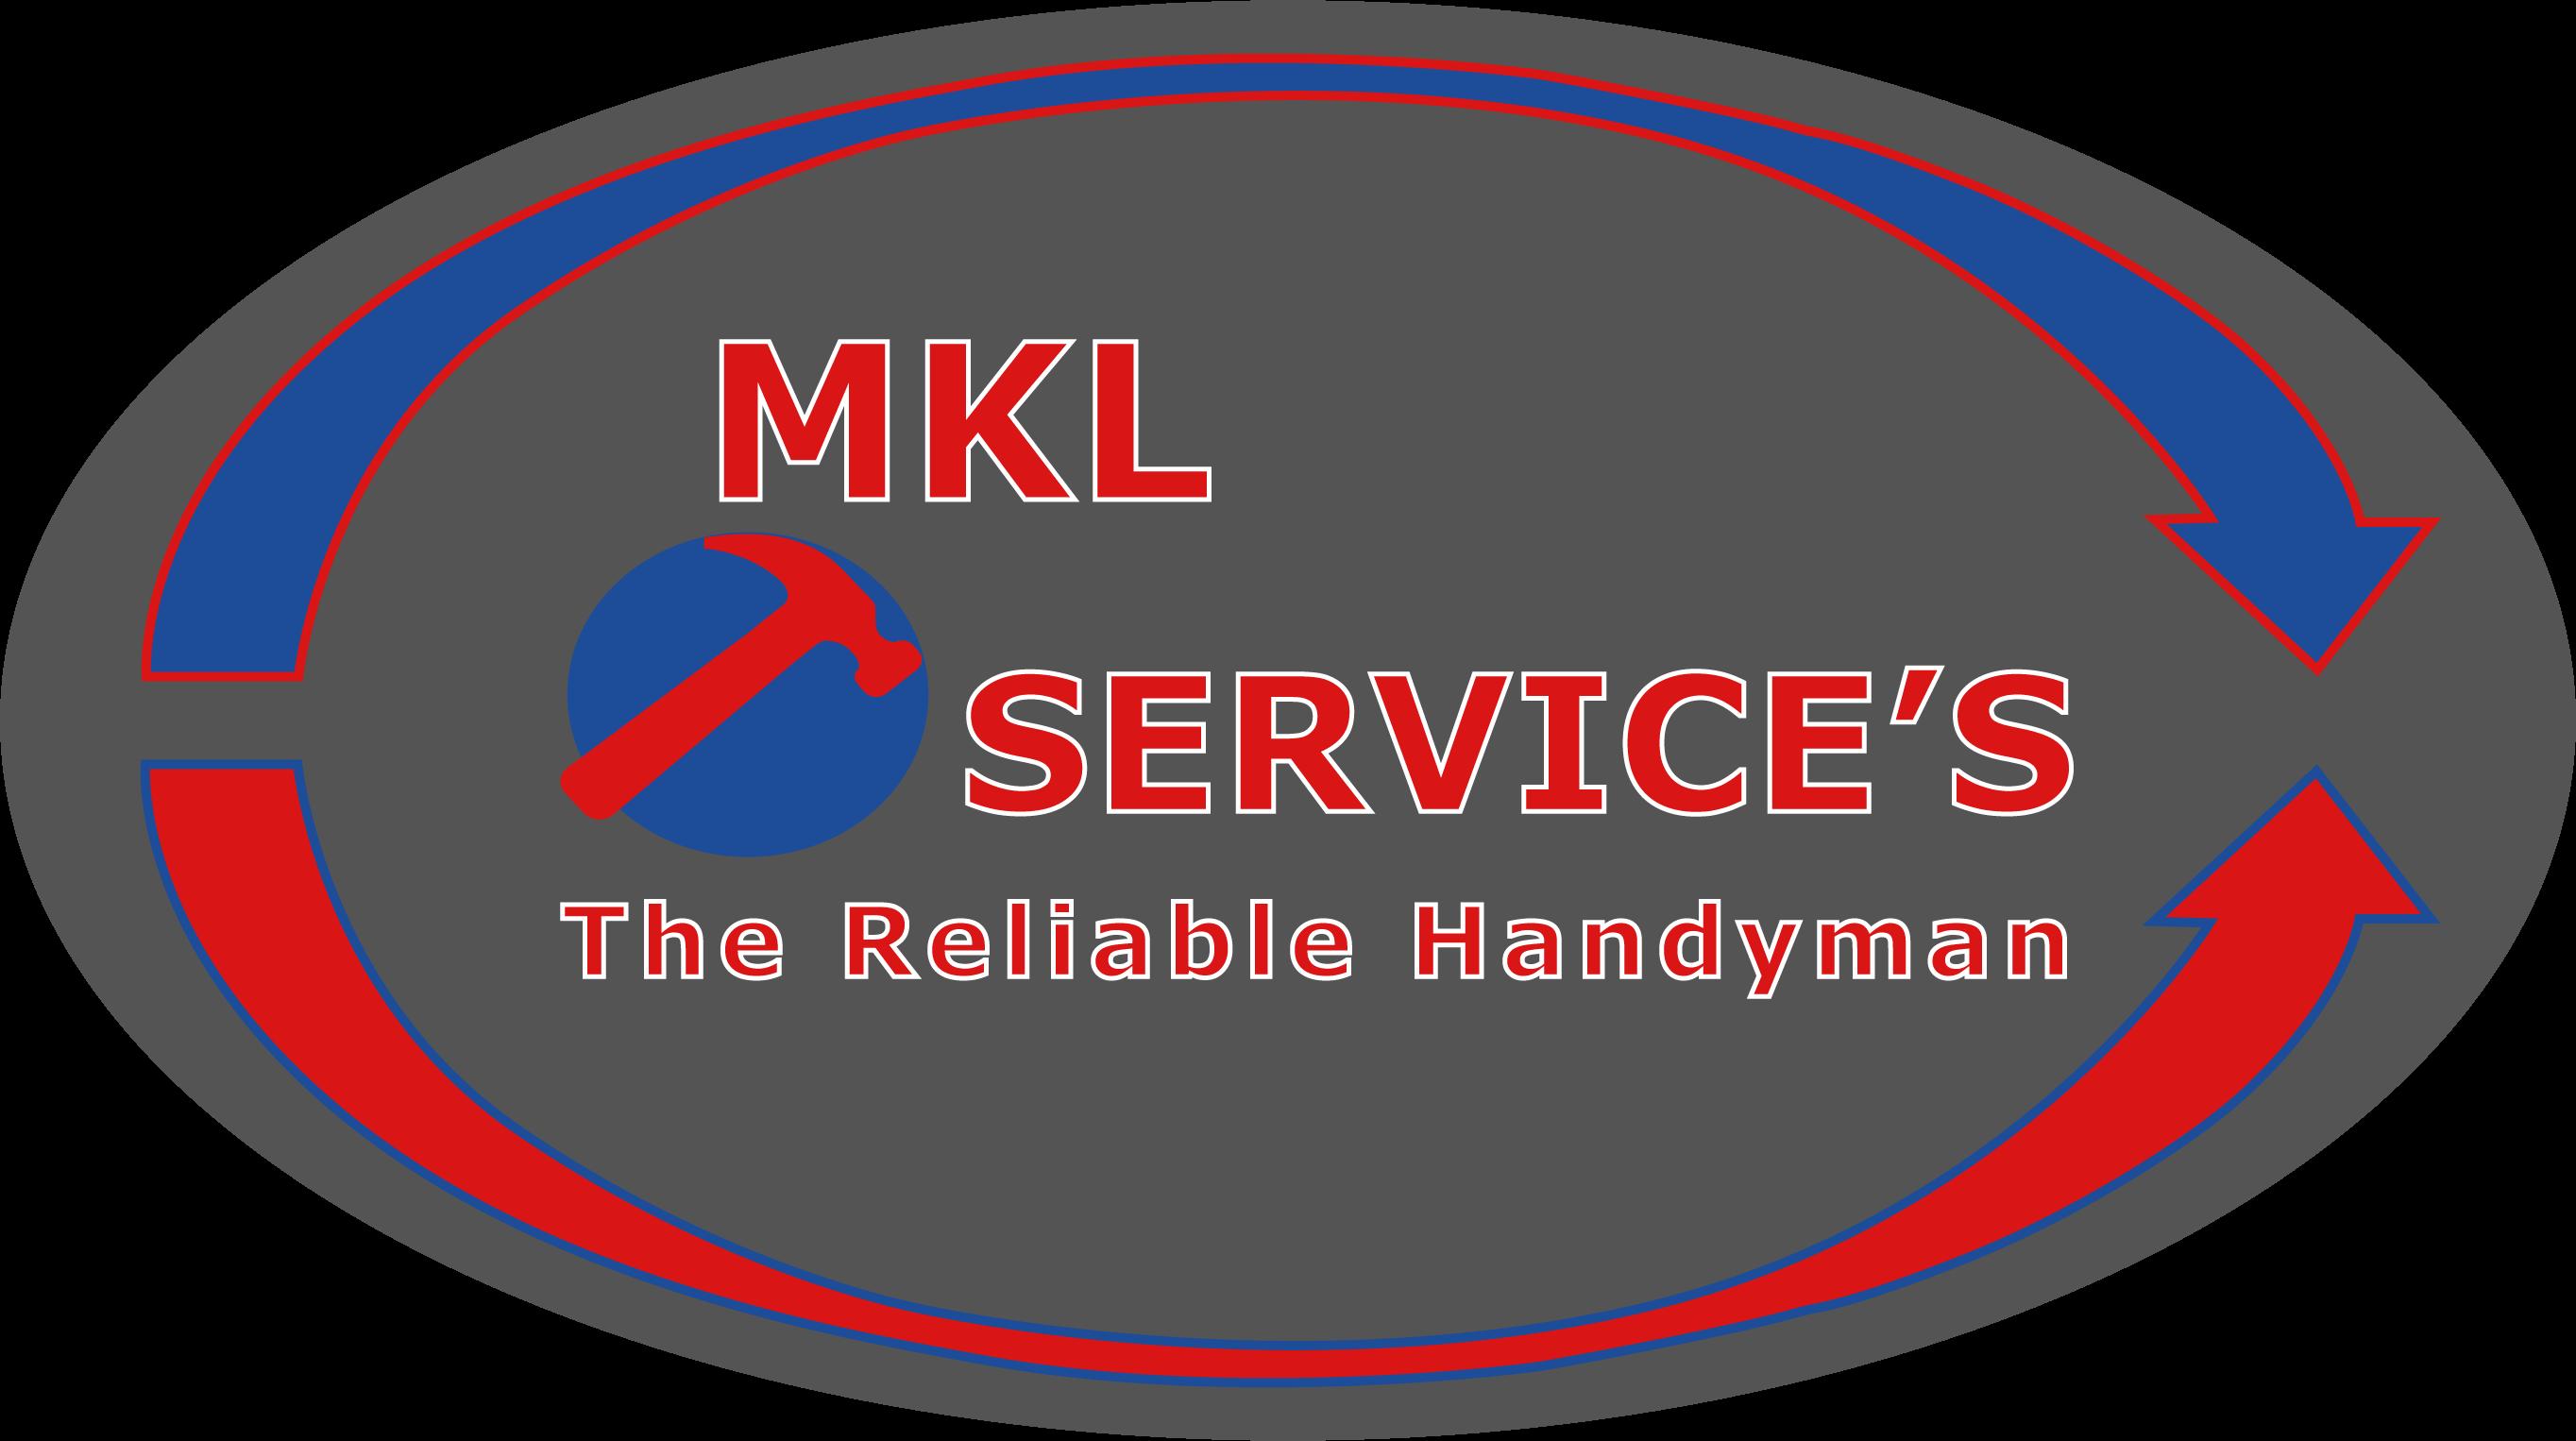 MKL Services